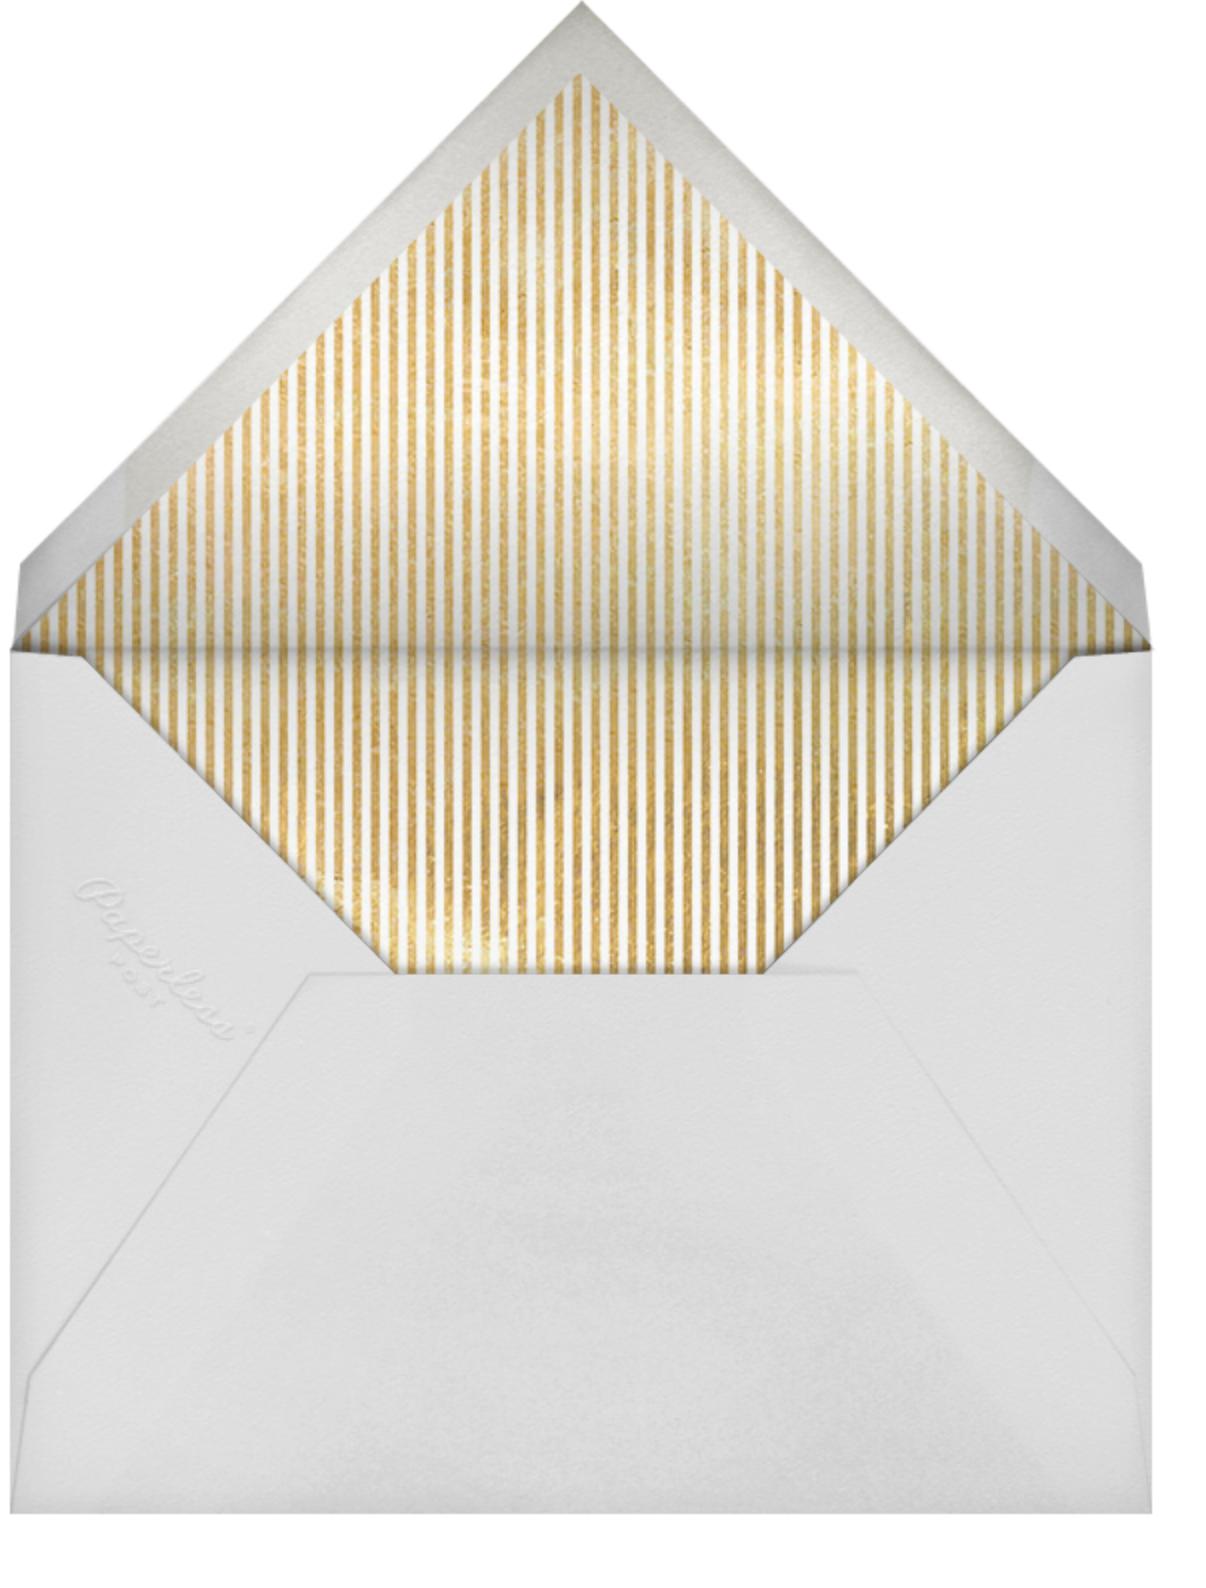 Milestone Dots (Forty) - Gray - Sugar Paper - Envelope